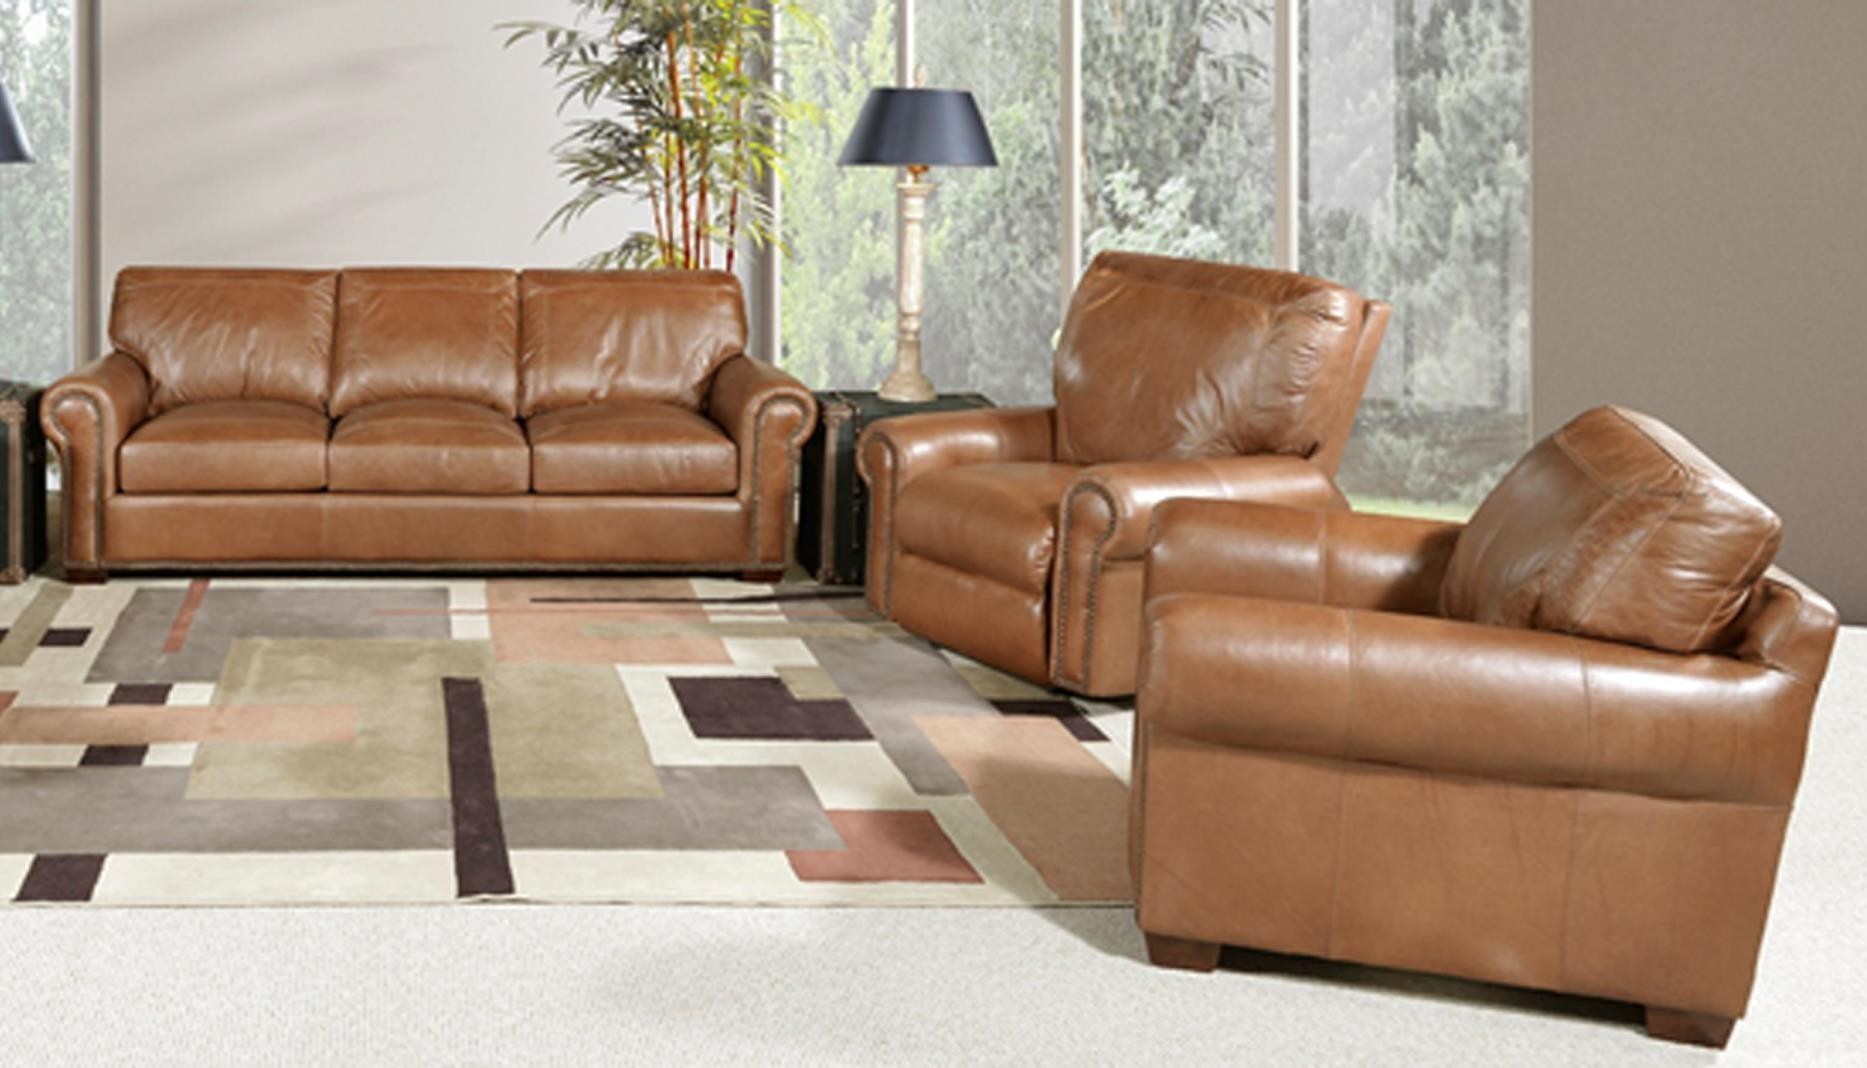 - USA Premium Leather Saddle Gator 4955-30+10-251 Saddle Leather